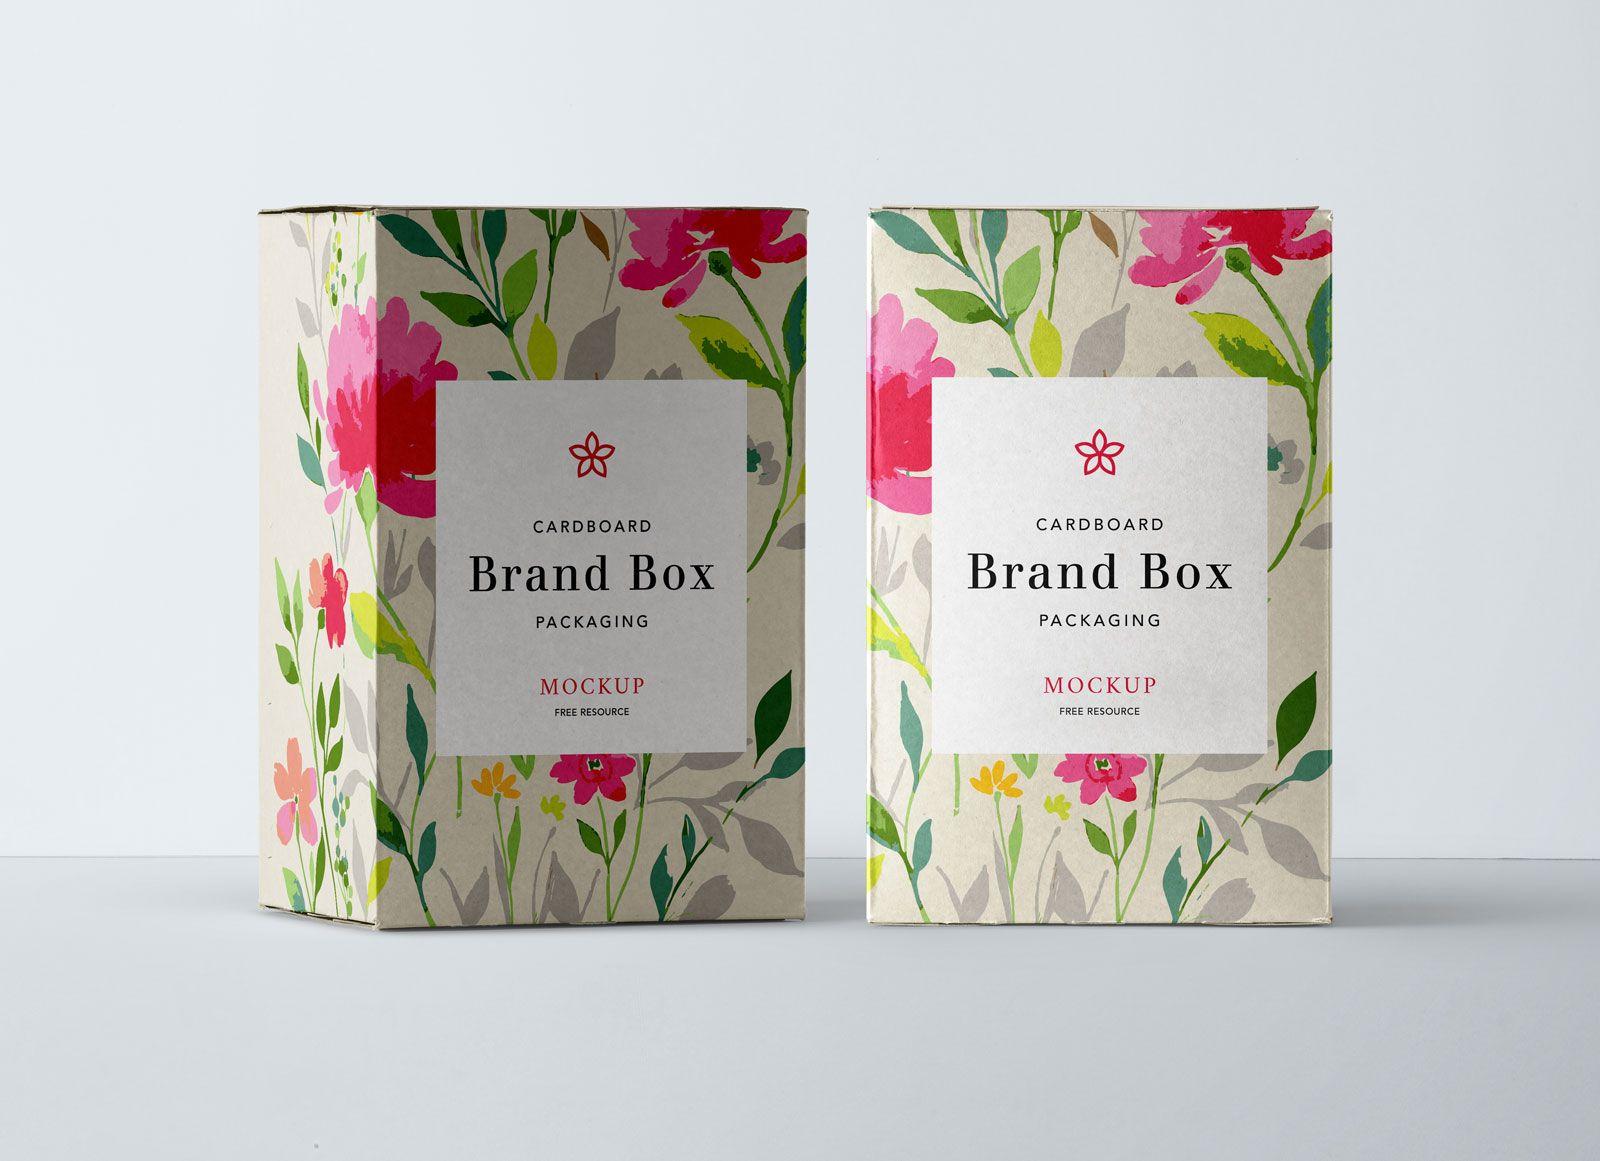 Free Cardboard Product Box Packaging Mockup PSD